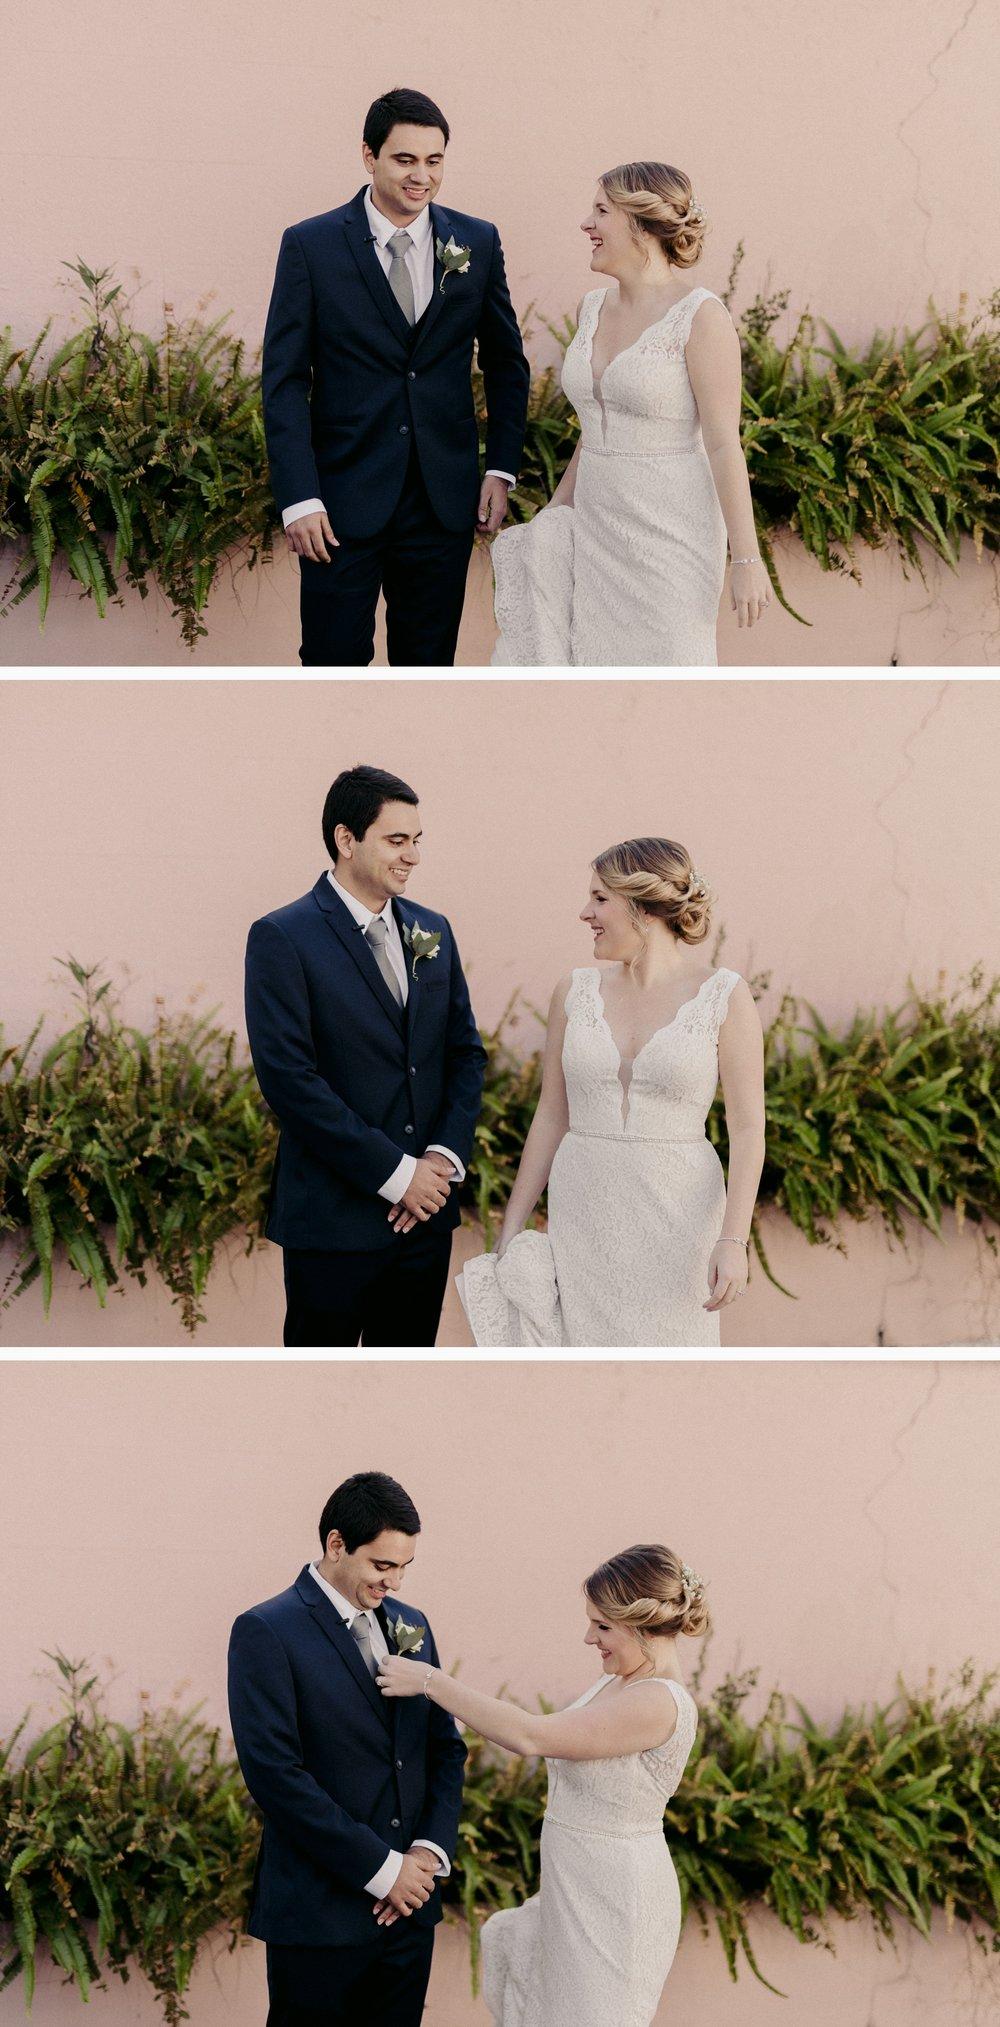 Tiffany-And-Junior-The-White-Room-St-Augustine-Wedding_0019.jpg